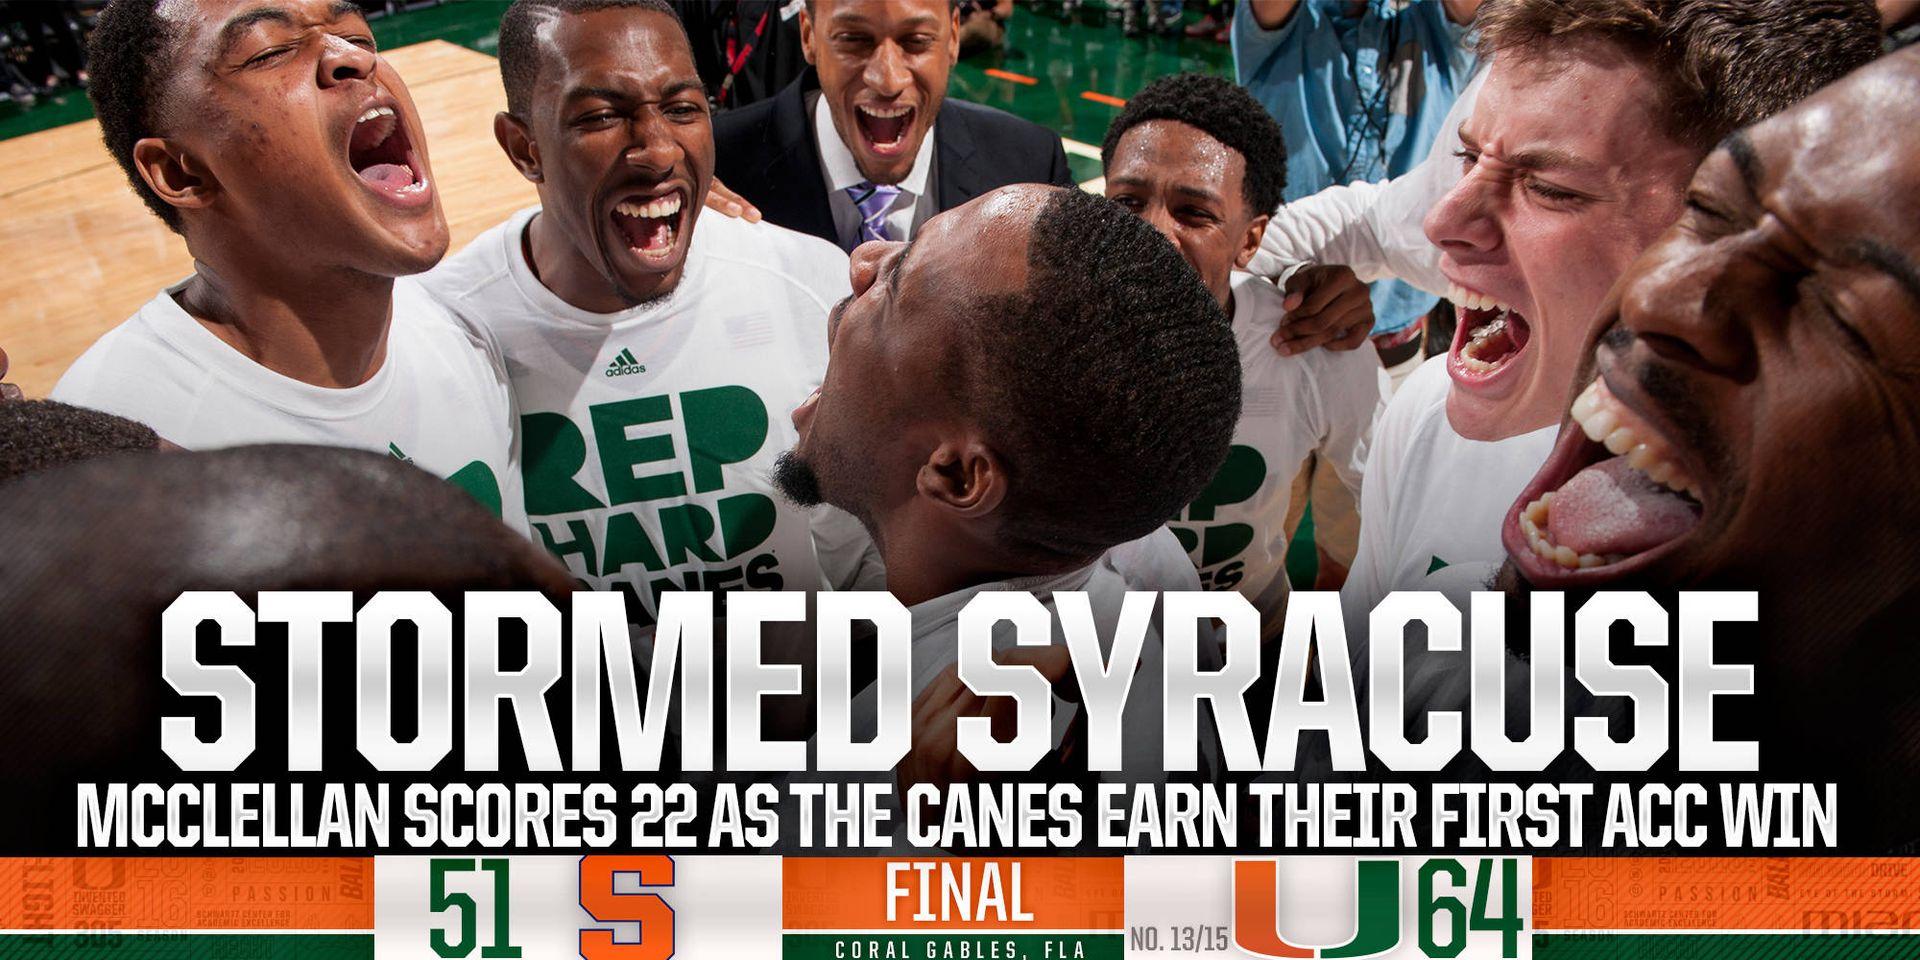 Stormed Syracuse